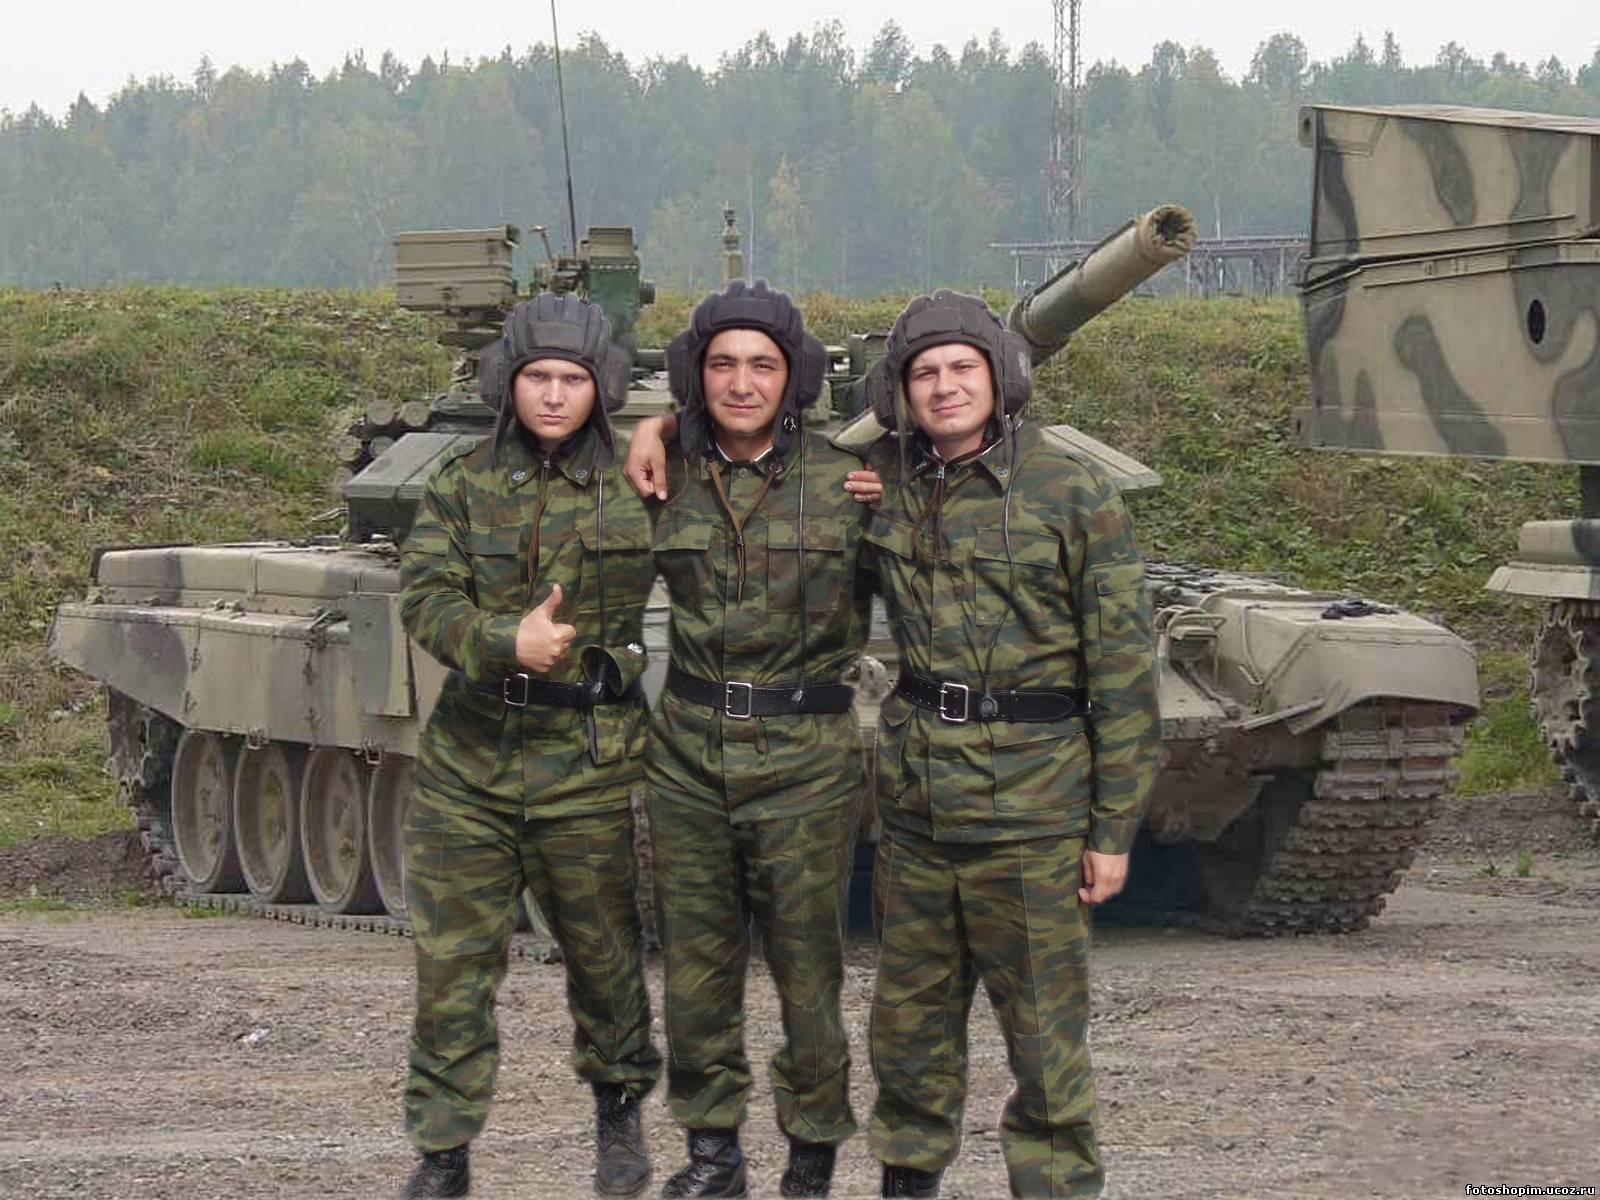 Фотография с названием три танкиста